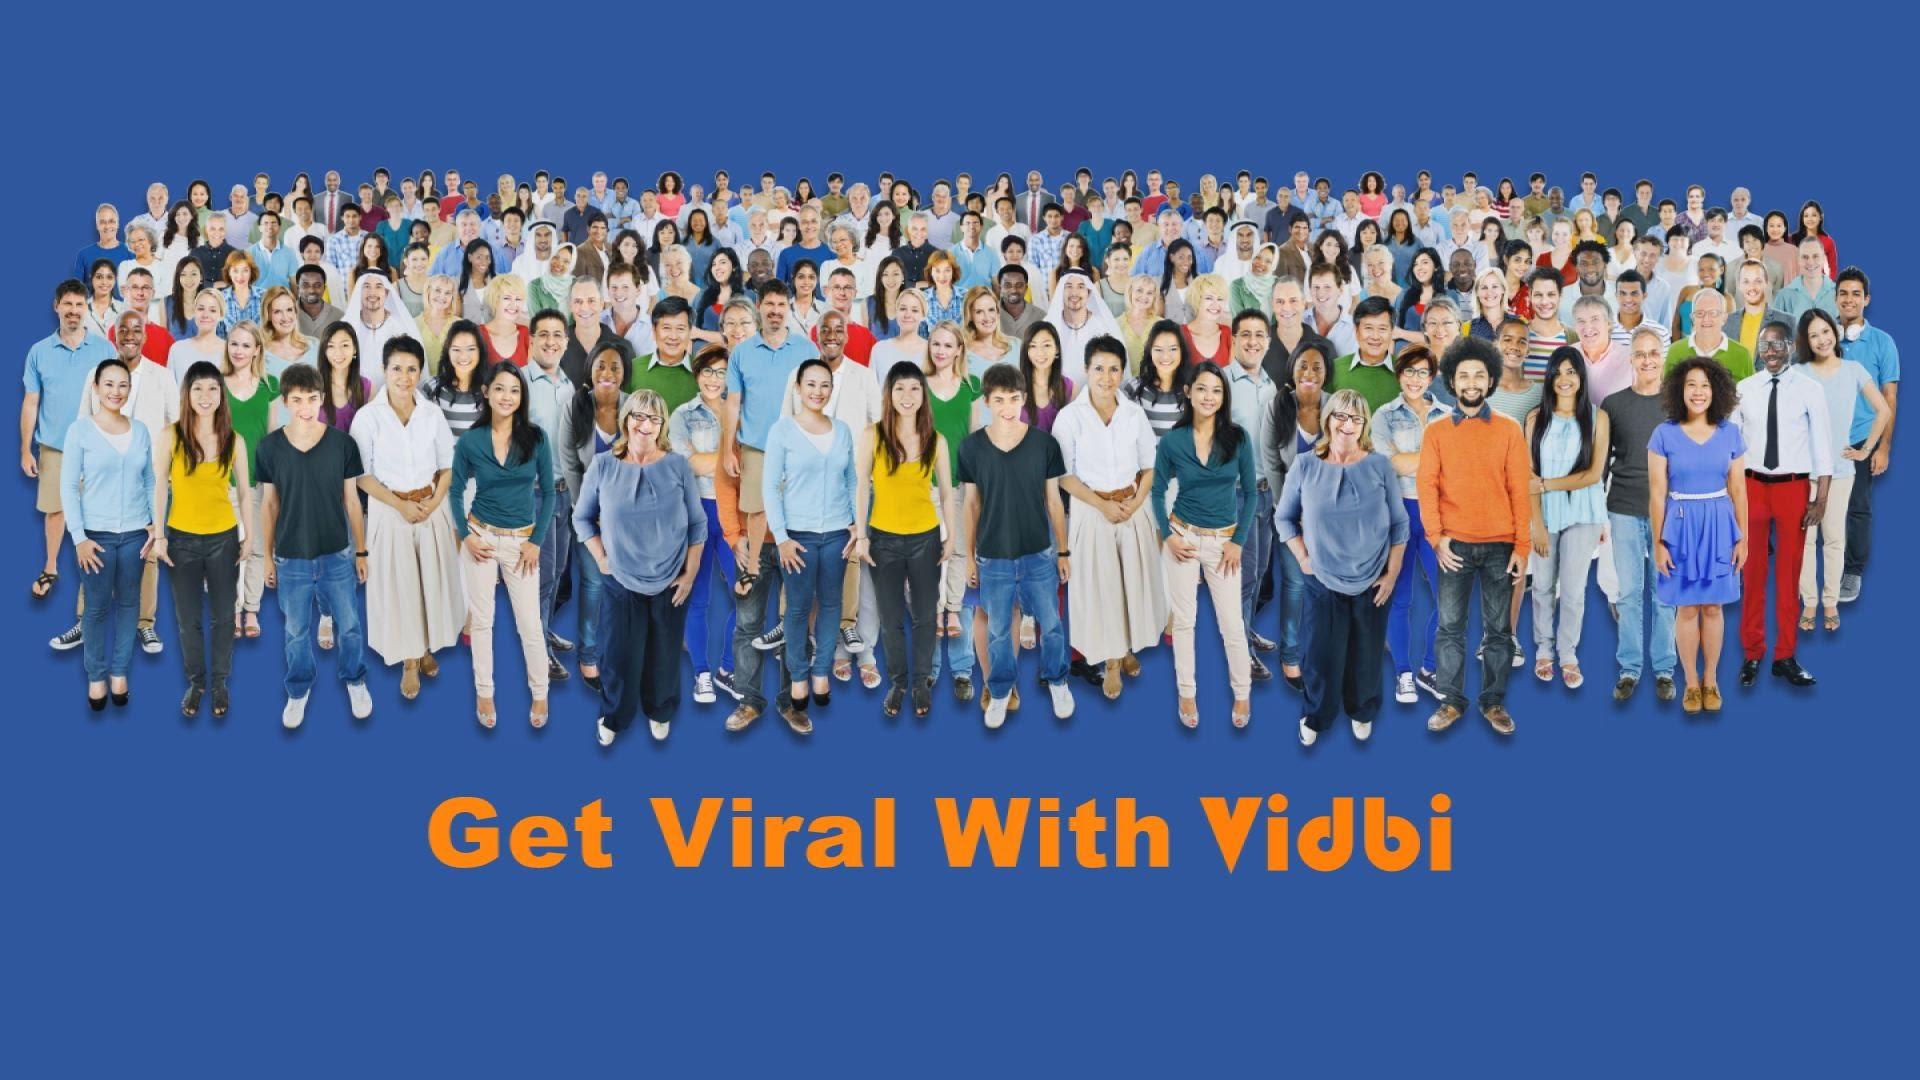 Vidbi Video Production